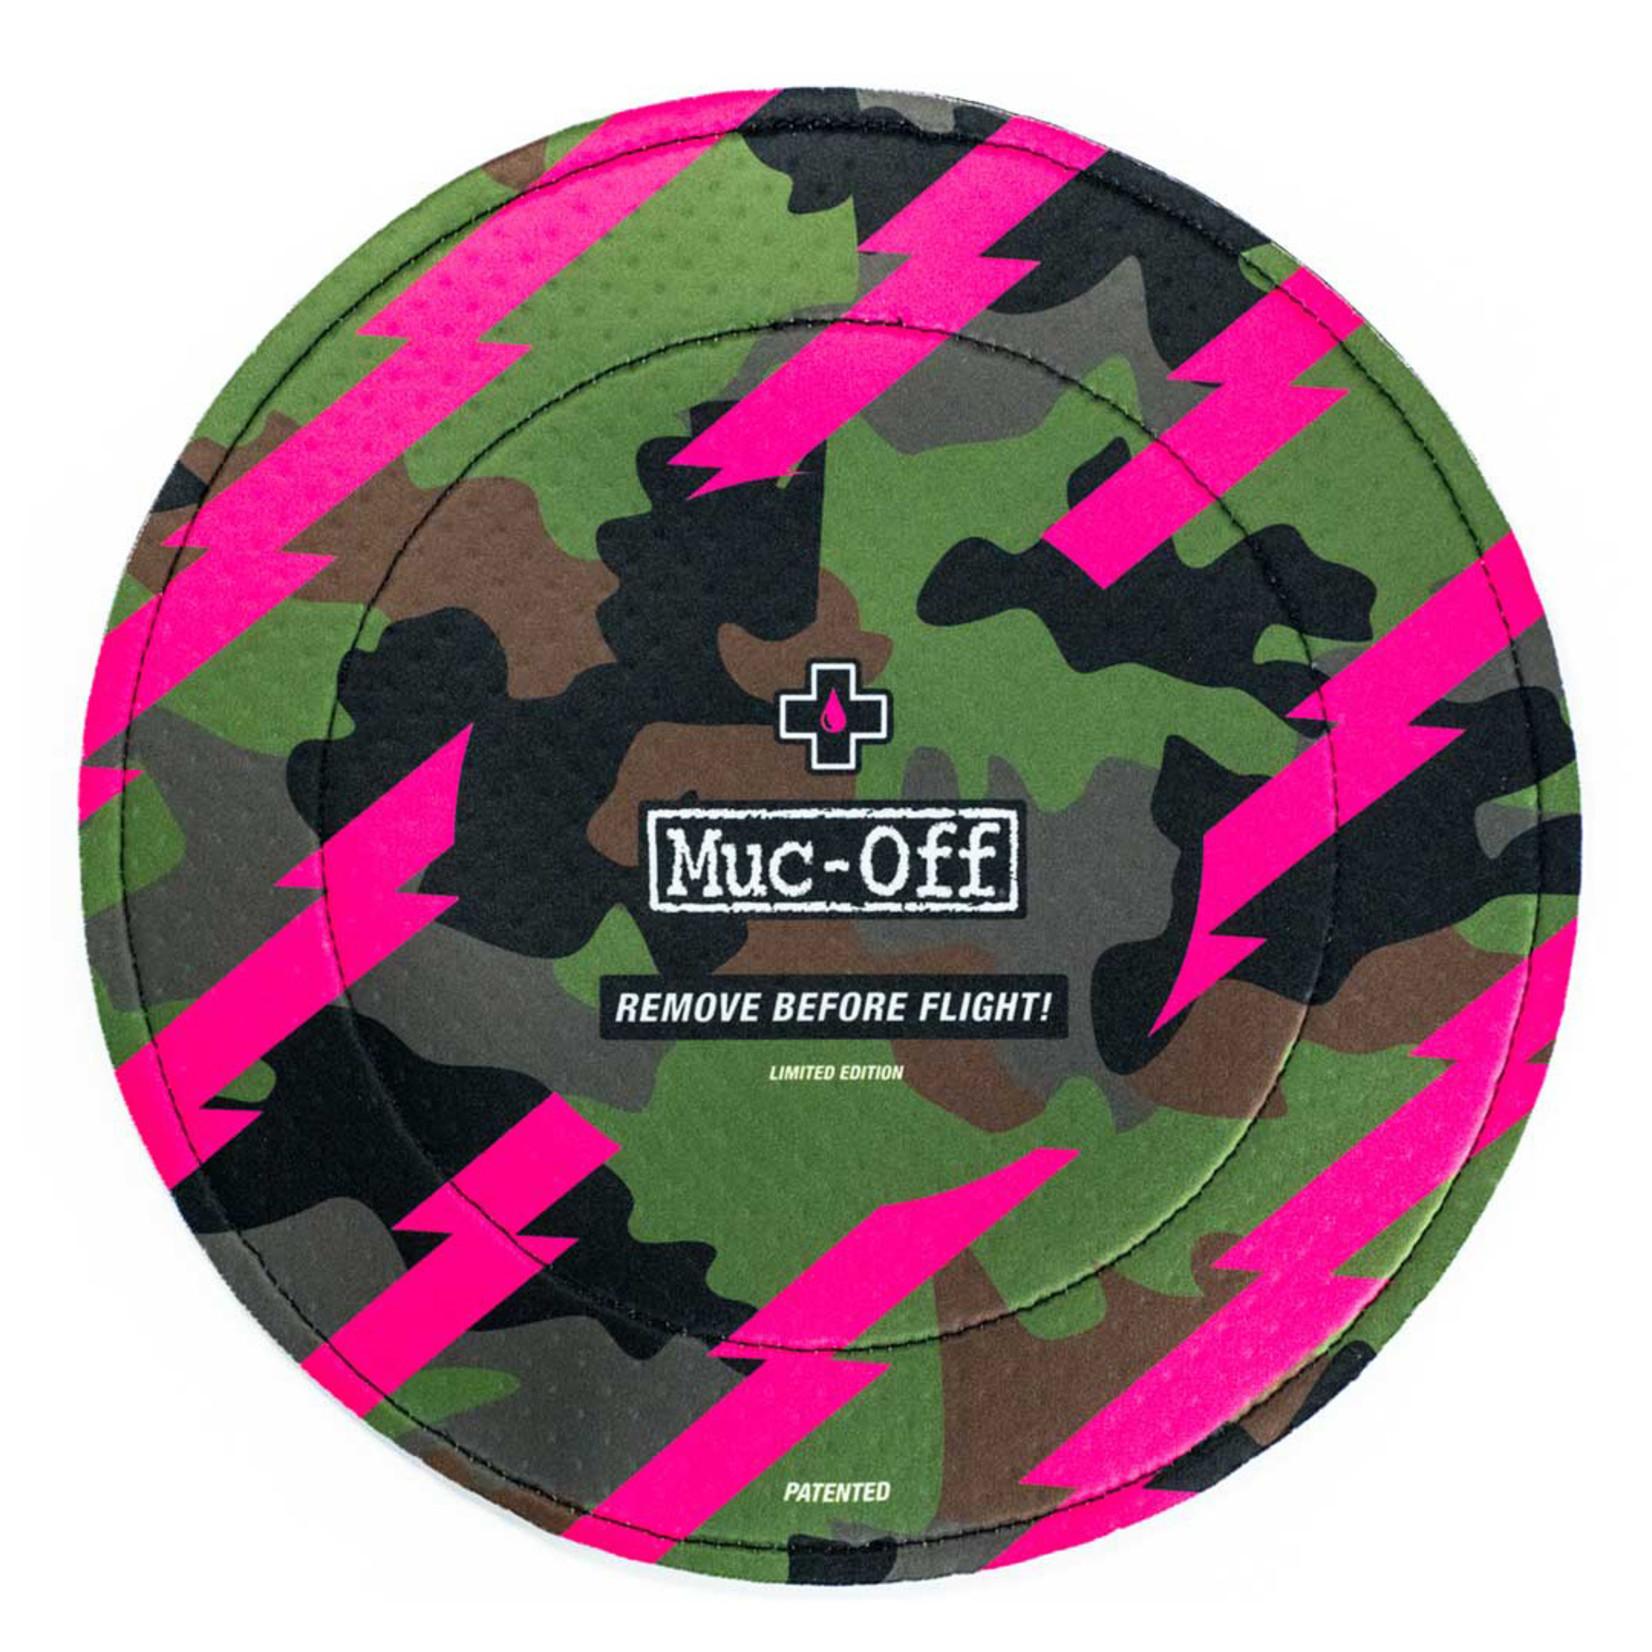 Muc-Off Muc-Off, Disc Brake Cover, Camo, Pair